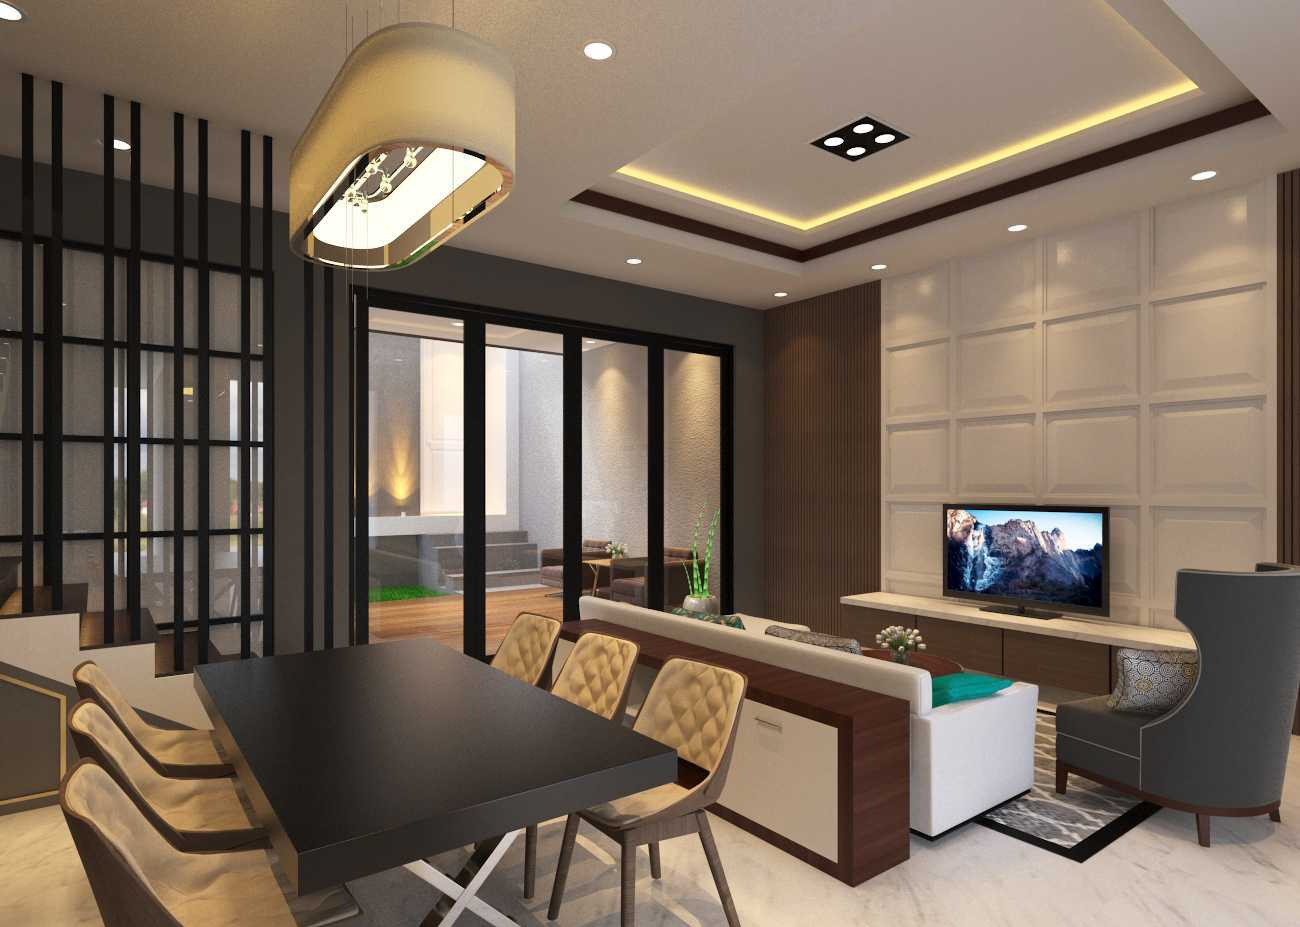 Sense Studio Residence - Surabaya Surabaya, Kota Sby, Jawa Timur, Indonesia Surabaya, Kota Sby, Jawa Timur, Indonesia Sense-Studio-Rumah-Tinggal-Kertomenanggal  51651